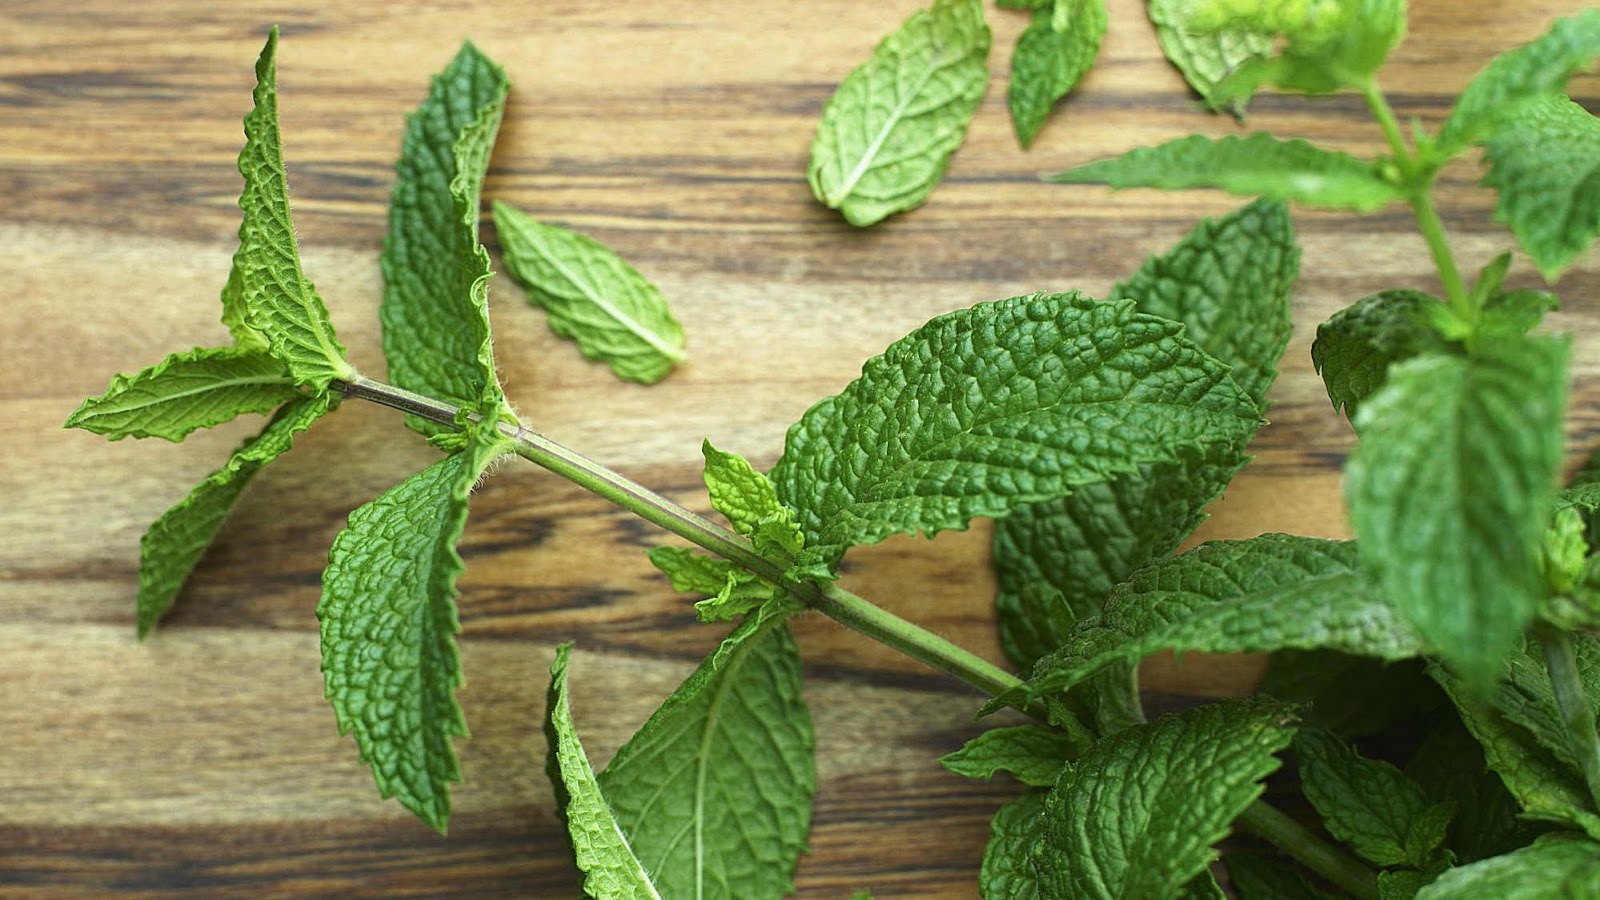 Mint's menthol may assist stomach problem